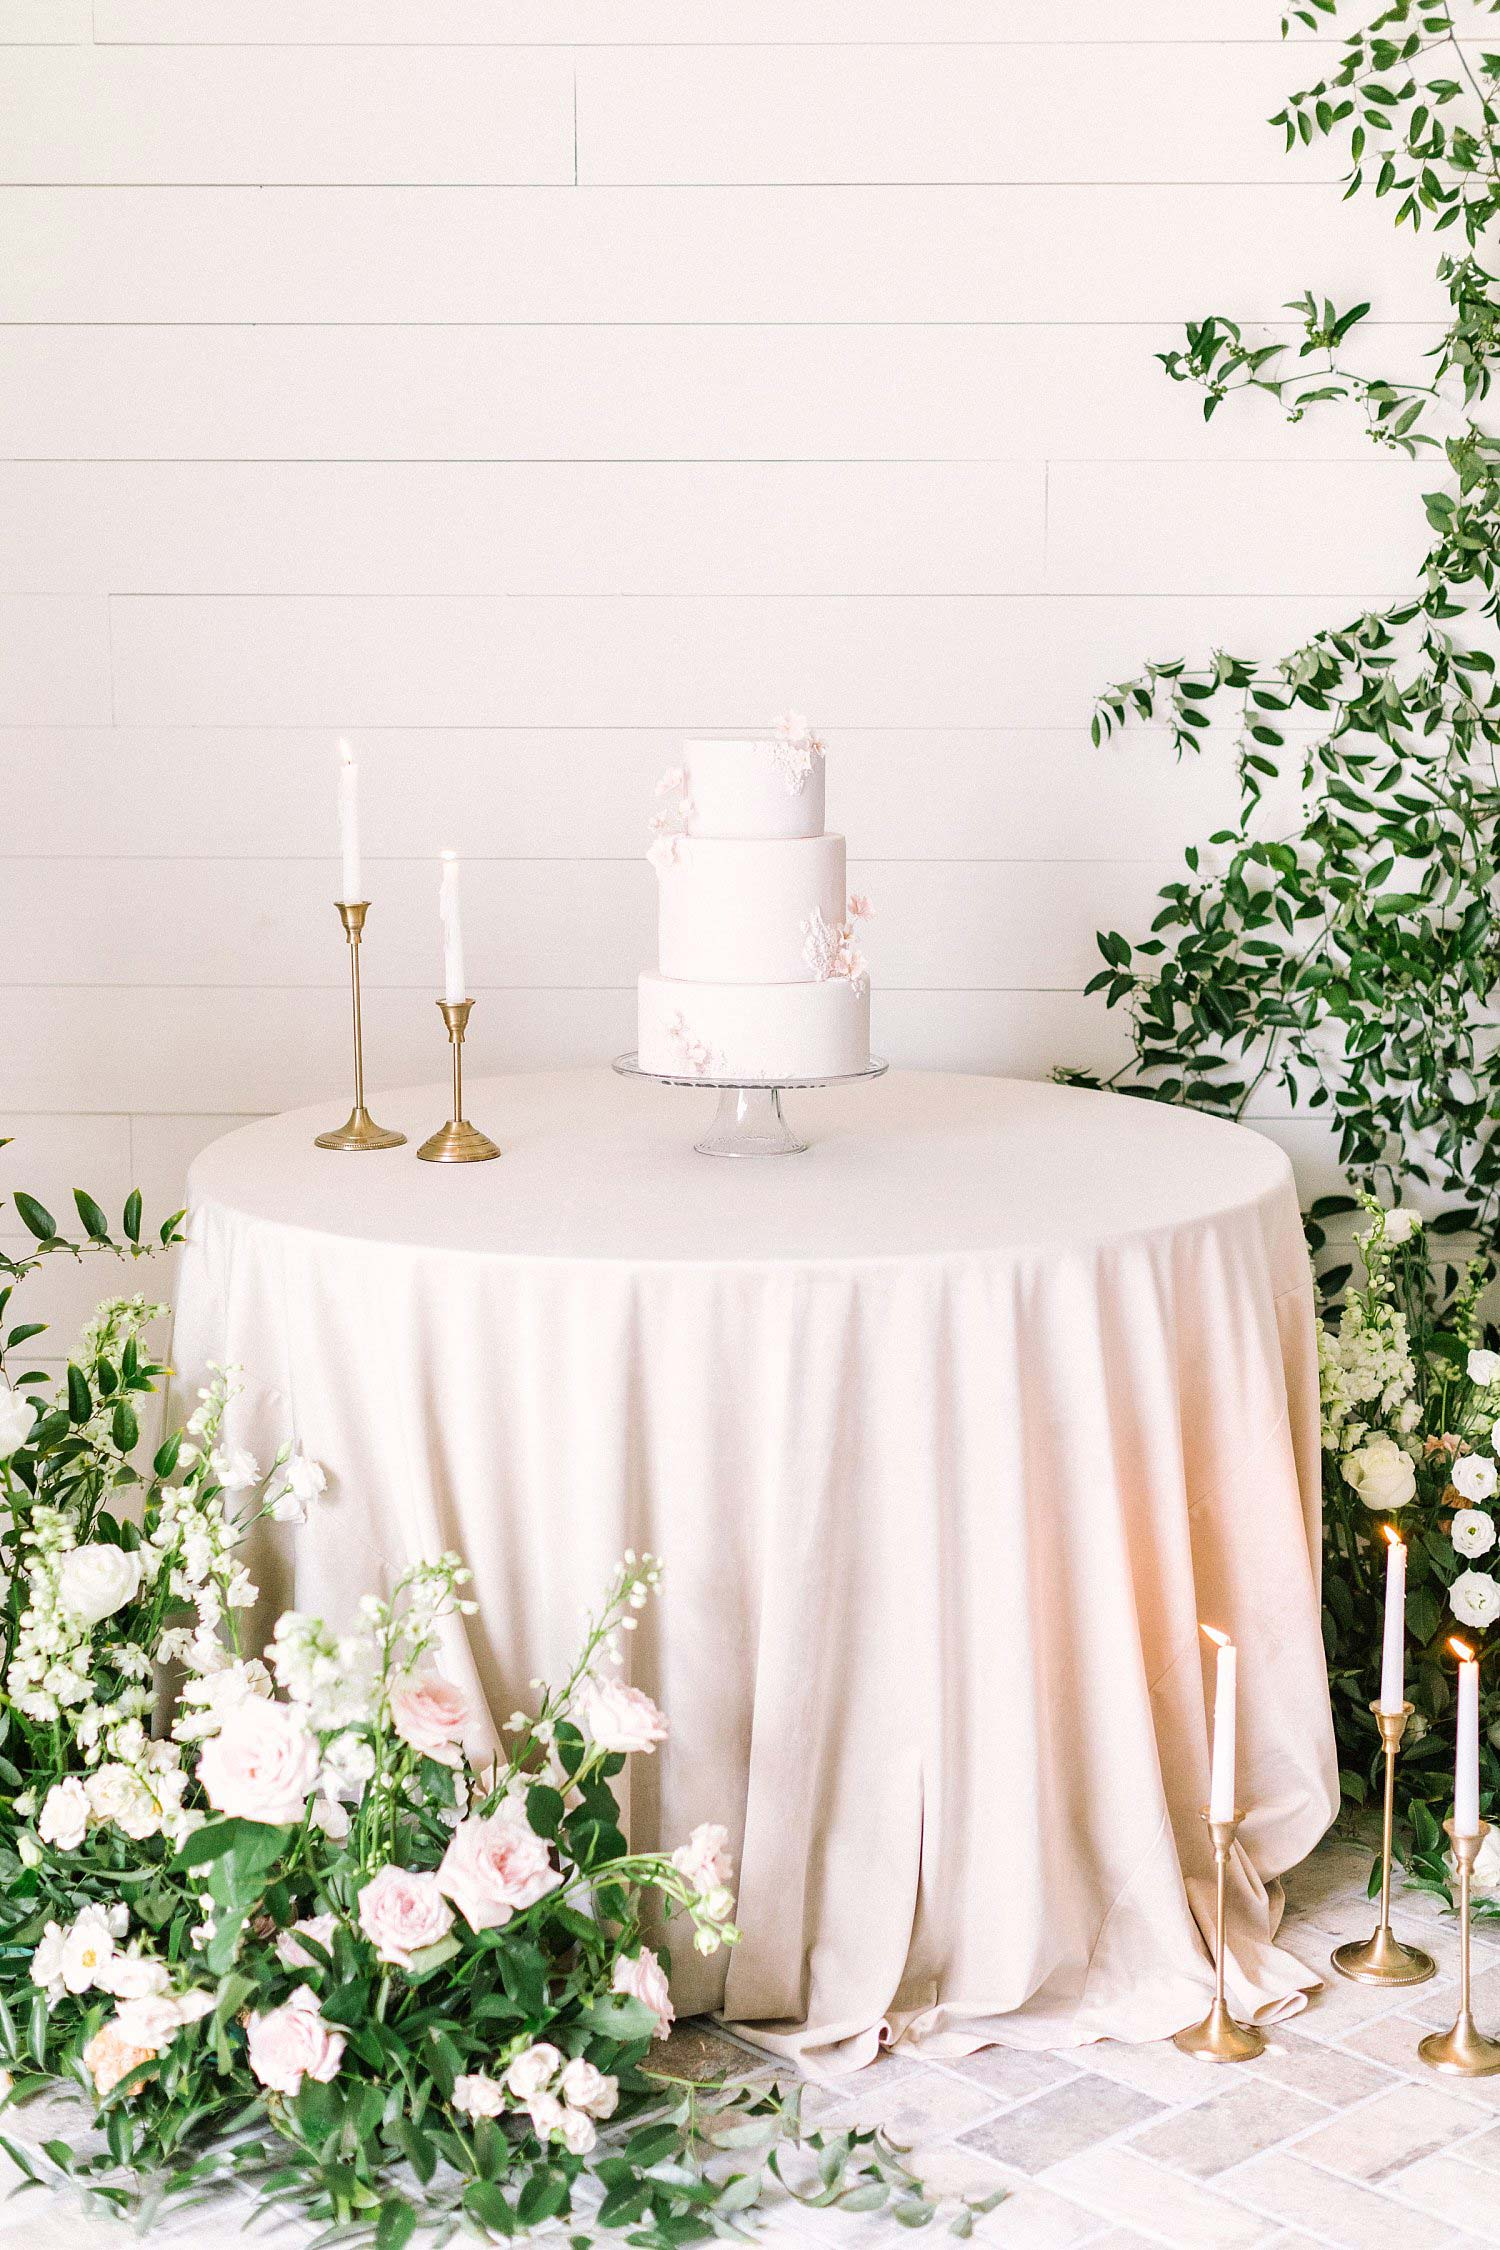 Grand_Texana_Wedding_0033.jpg